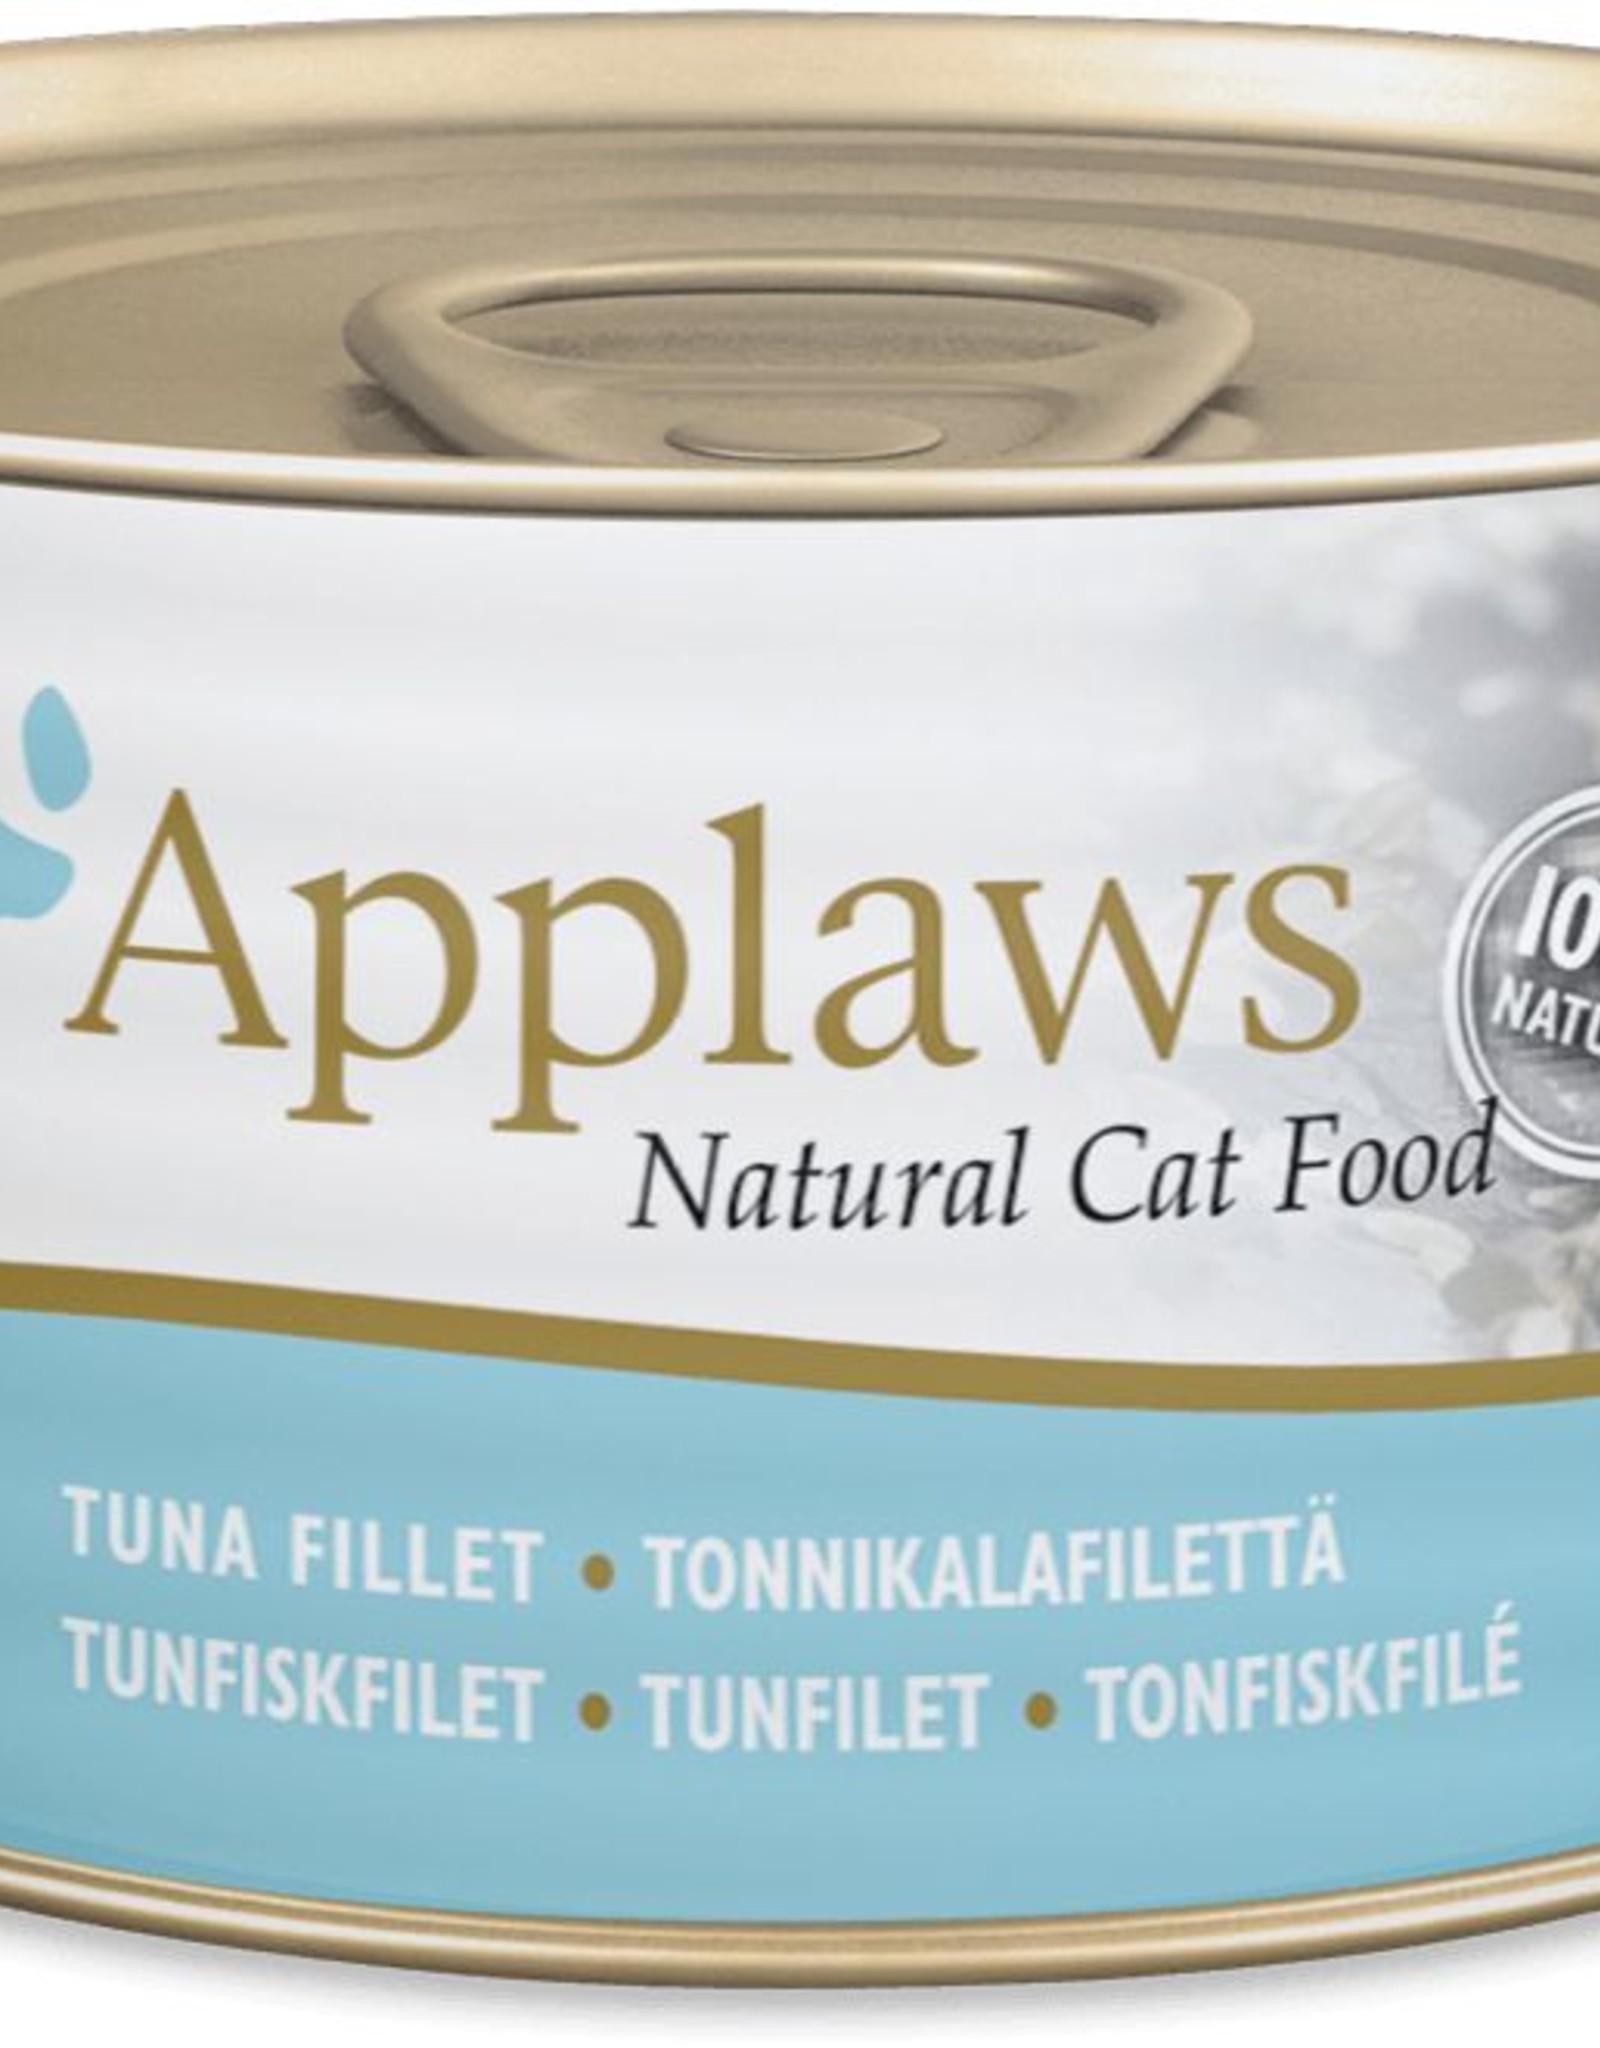 Applaws Cat Wet Food Tuna Fillet 70g